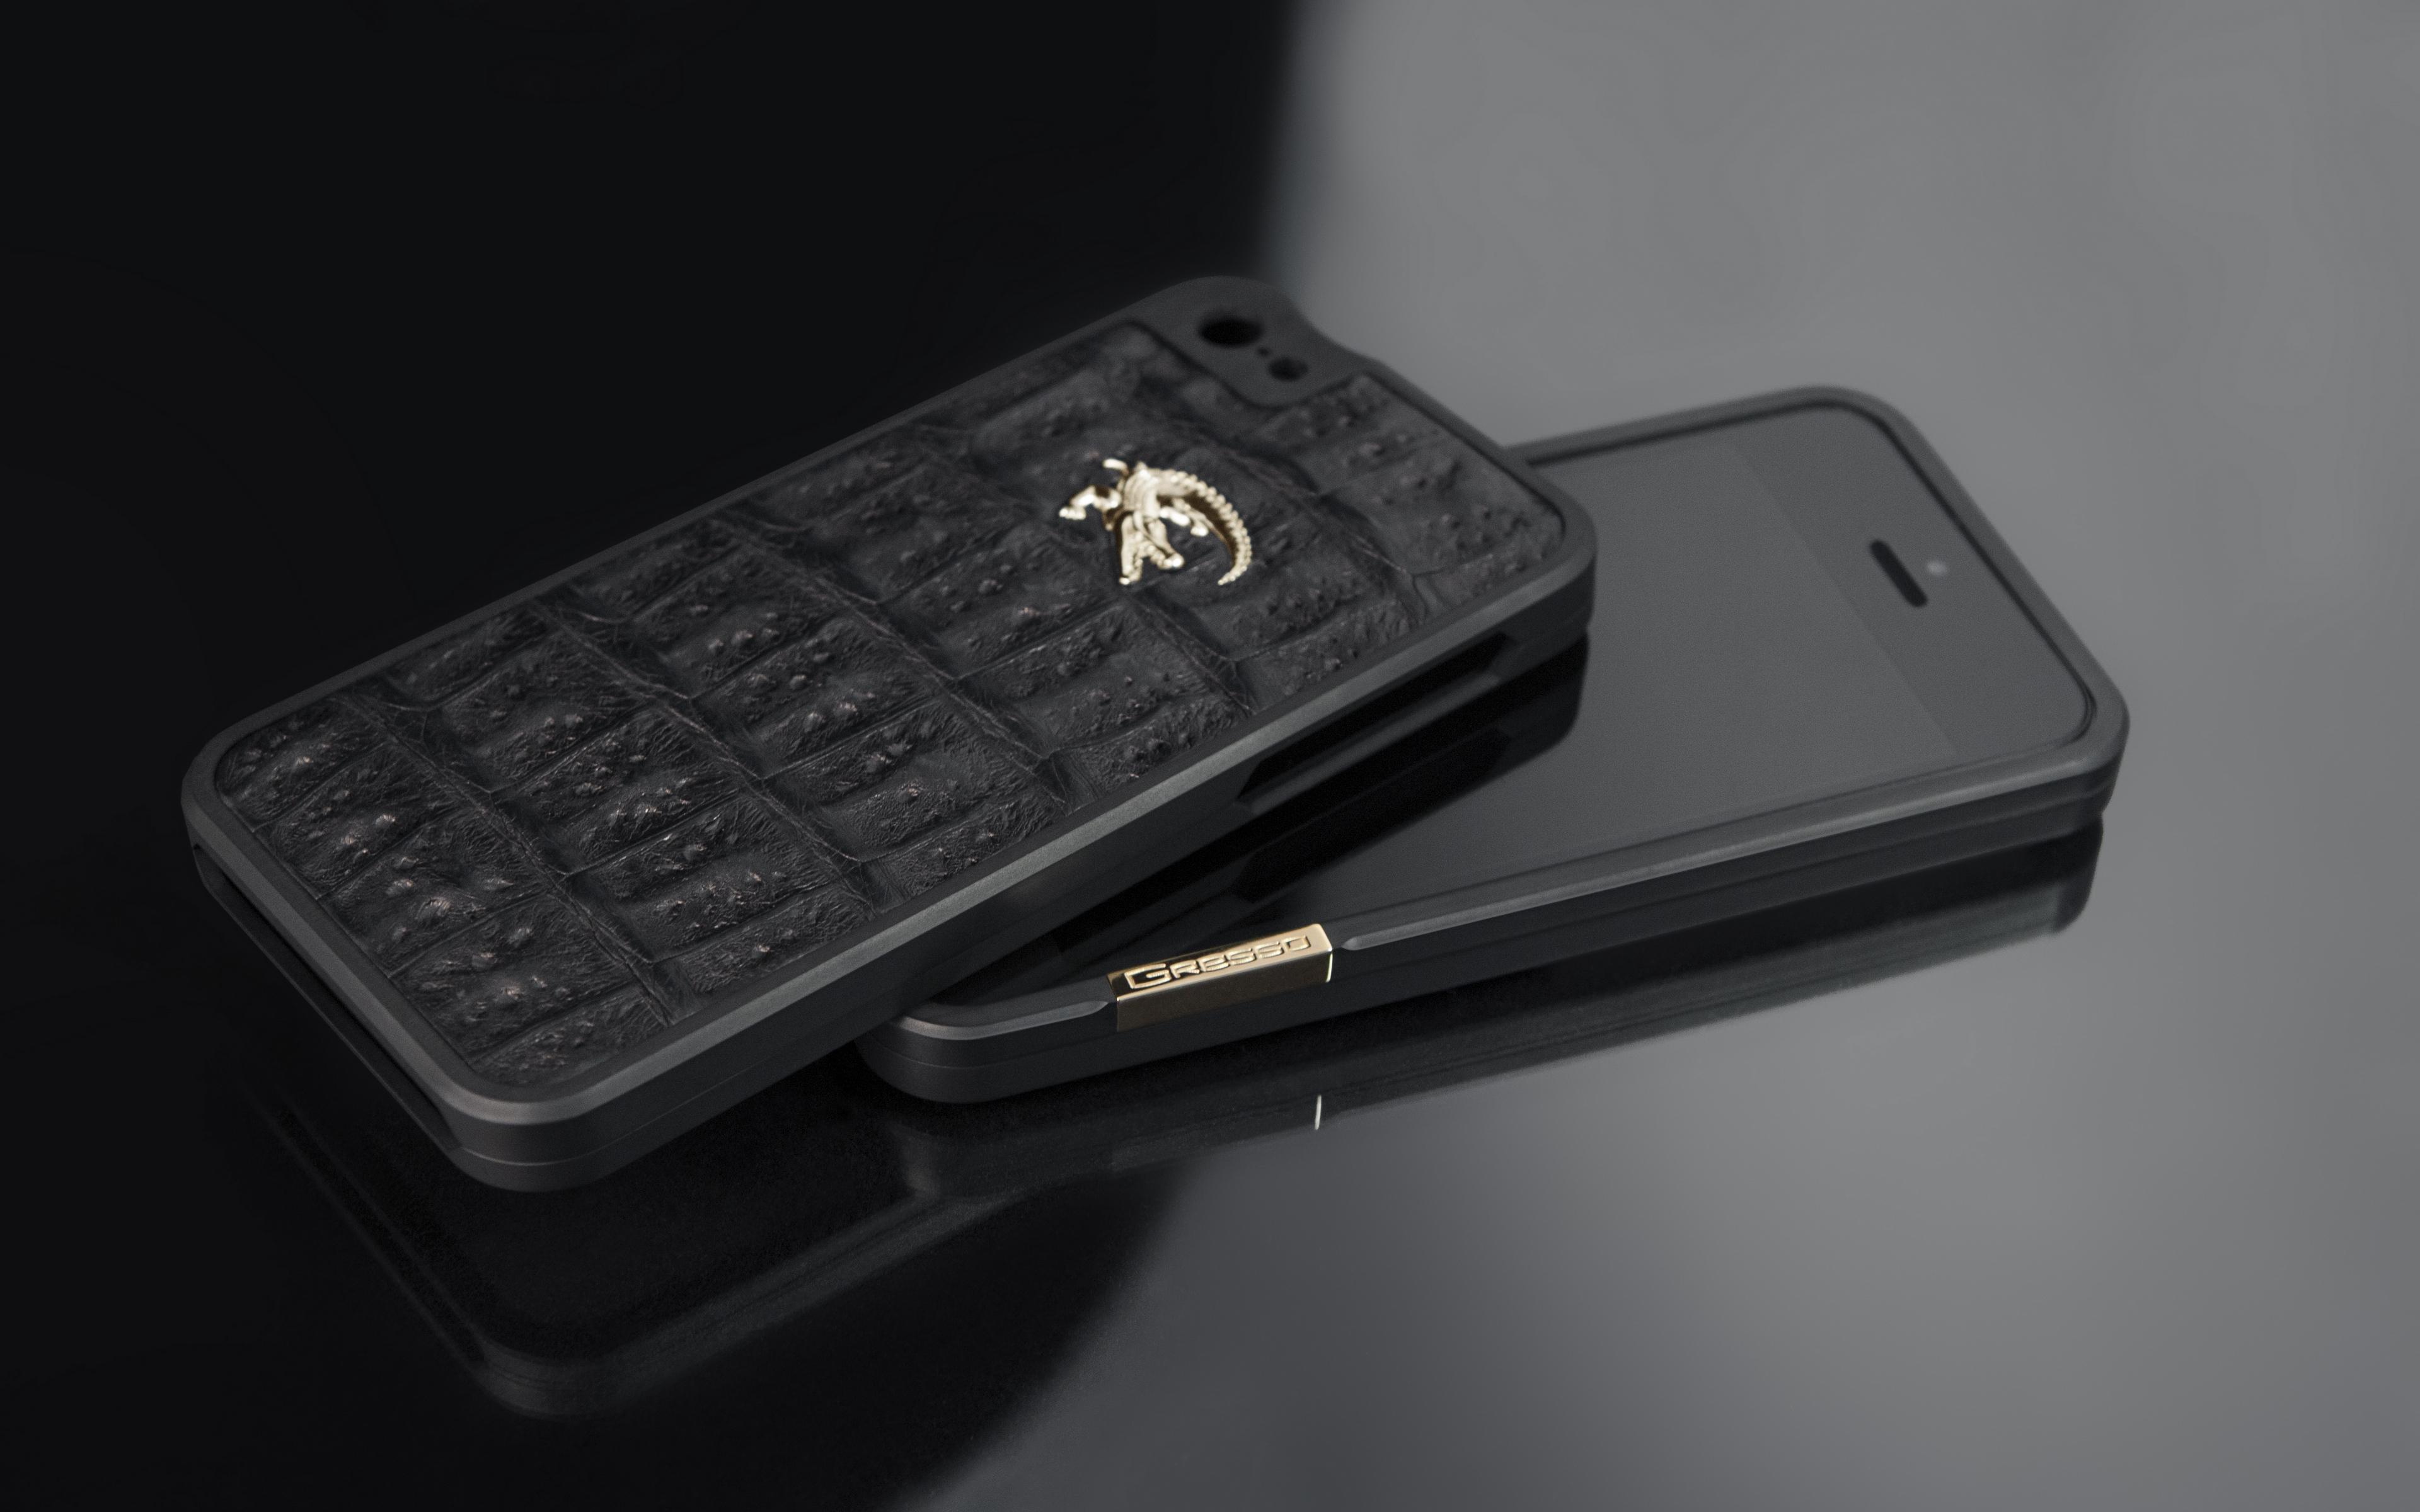 Wallpaper Gresso, Titanium Bumper, Iphone - Most Expensive Iphone 7 Plus Case , HD Wallpaper & Backgrounds